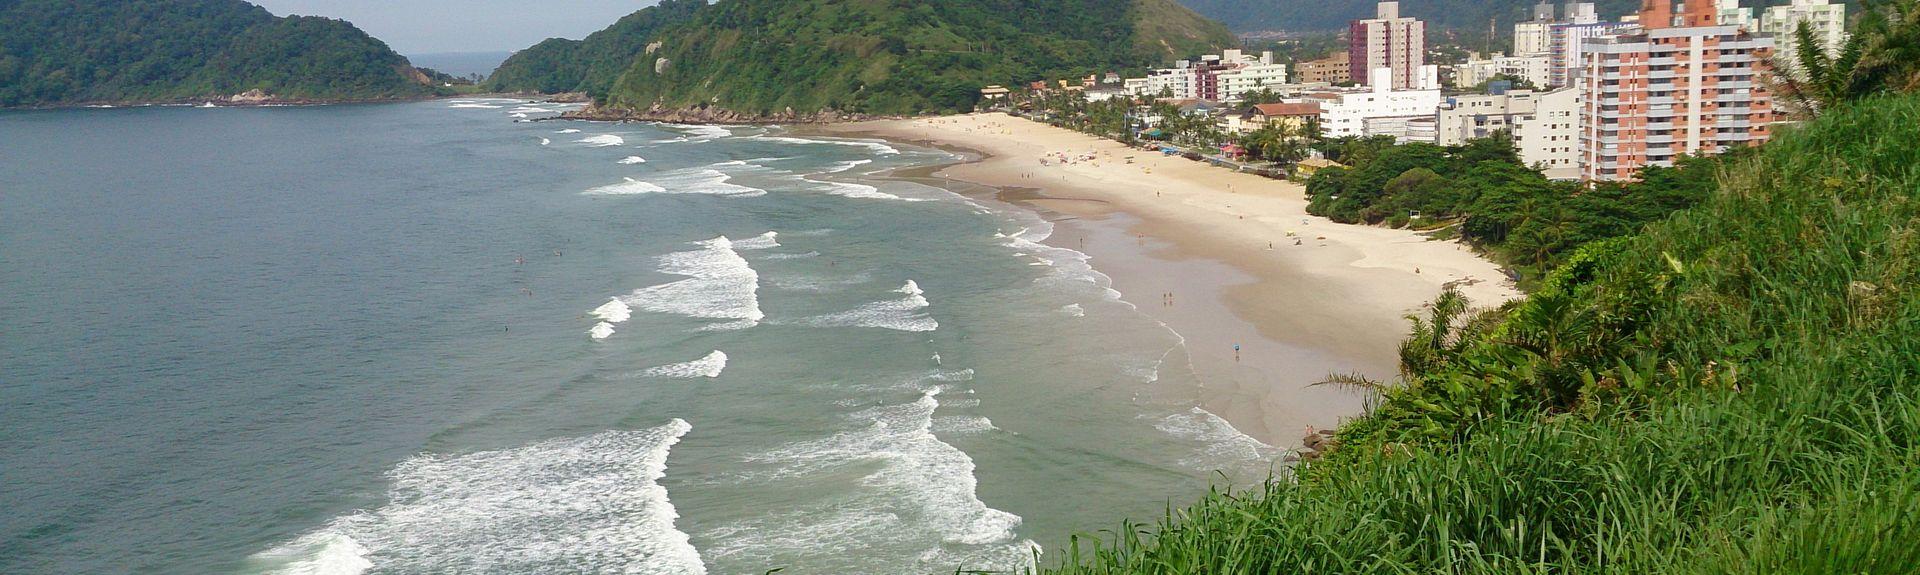 Praia do Guaíuba, Guarujá - SP, Brazil